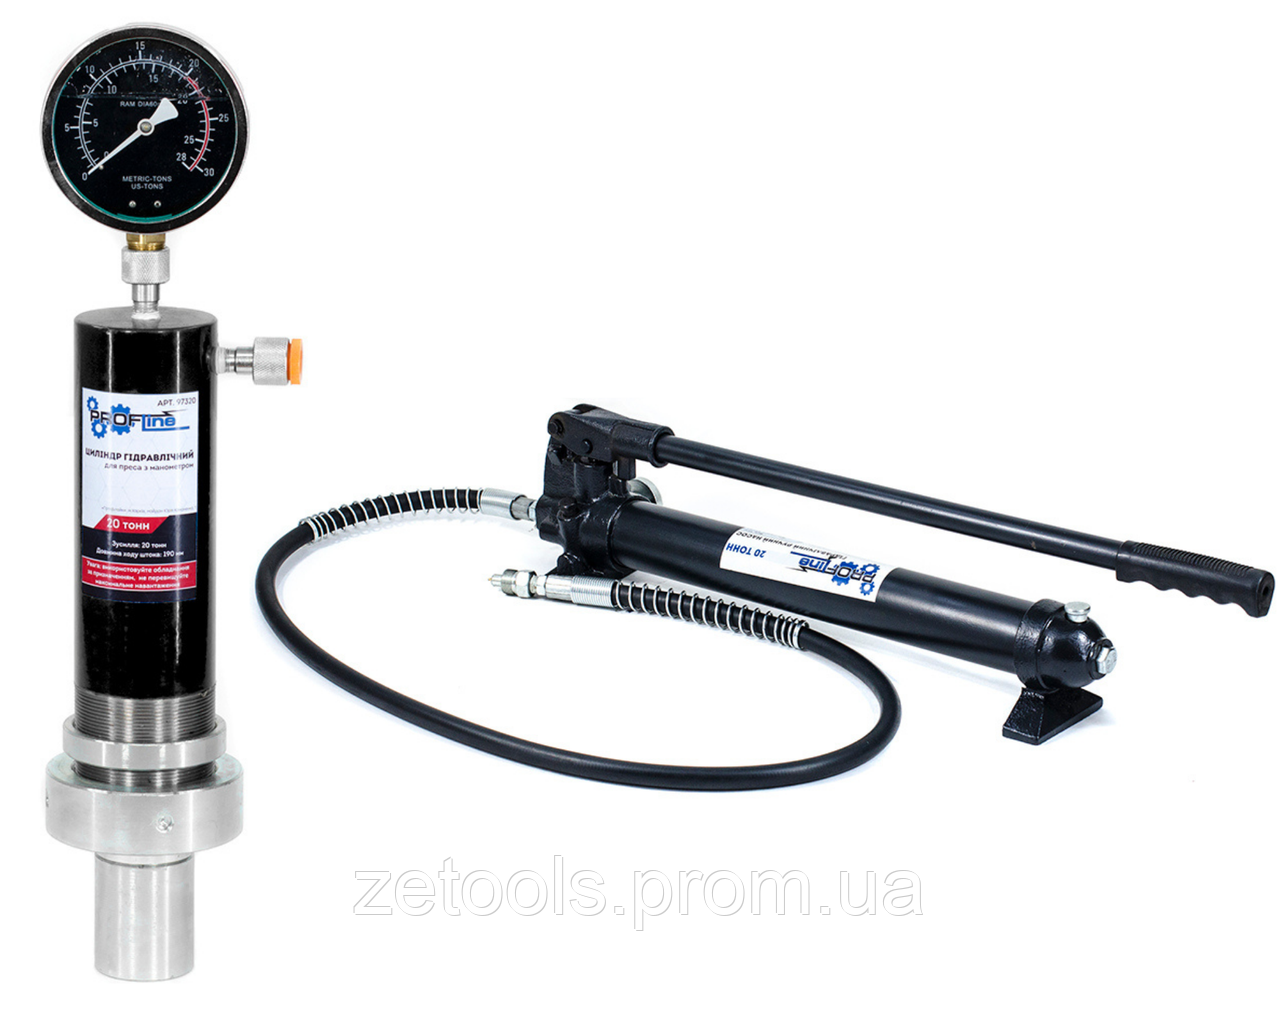 Цилиндр гидравлический для пресса с манометром 20 тонн Profline 97320 + насос на 20 тонн 97320+97106